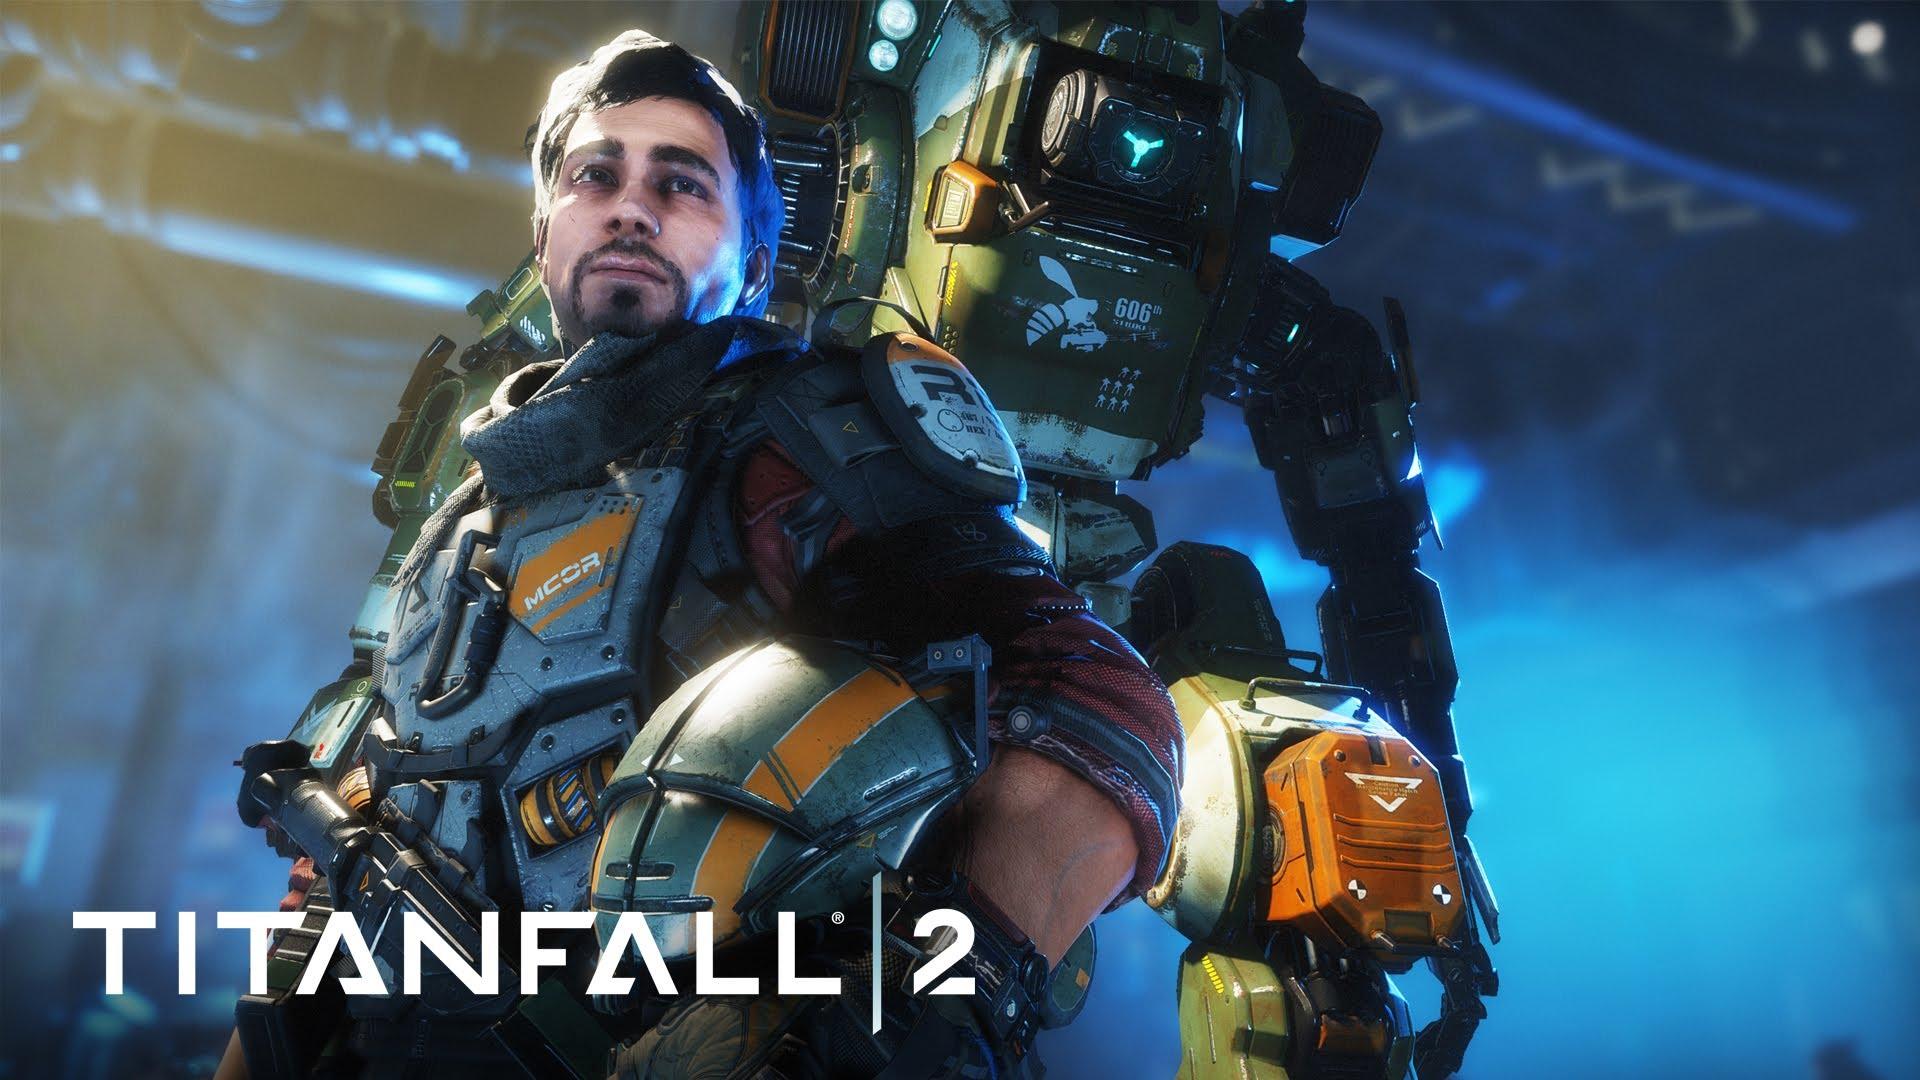 Titanfall 2 - Offizieller Singleplayer Trailer mit Fahri Yardim